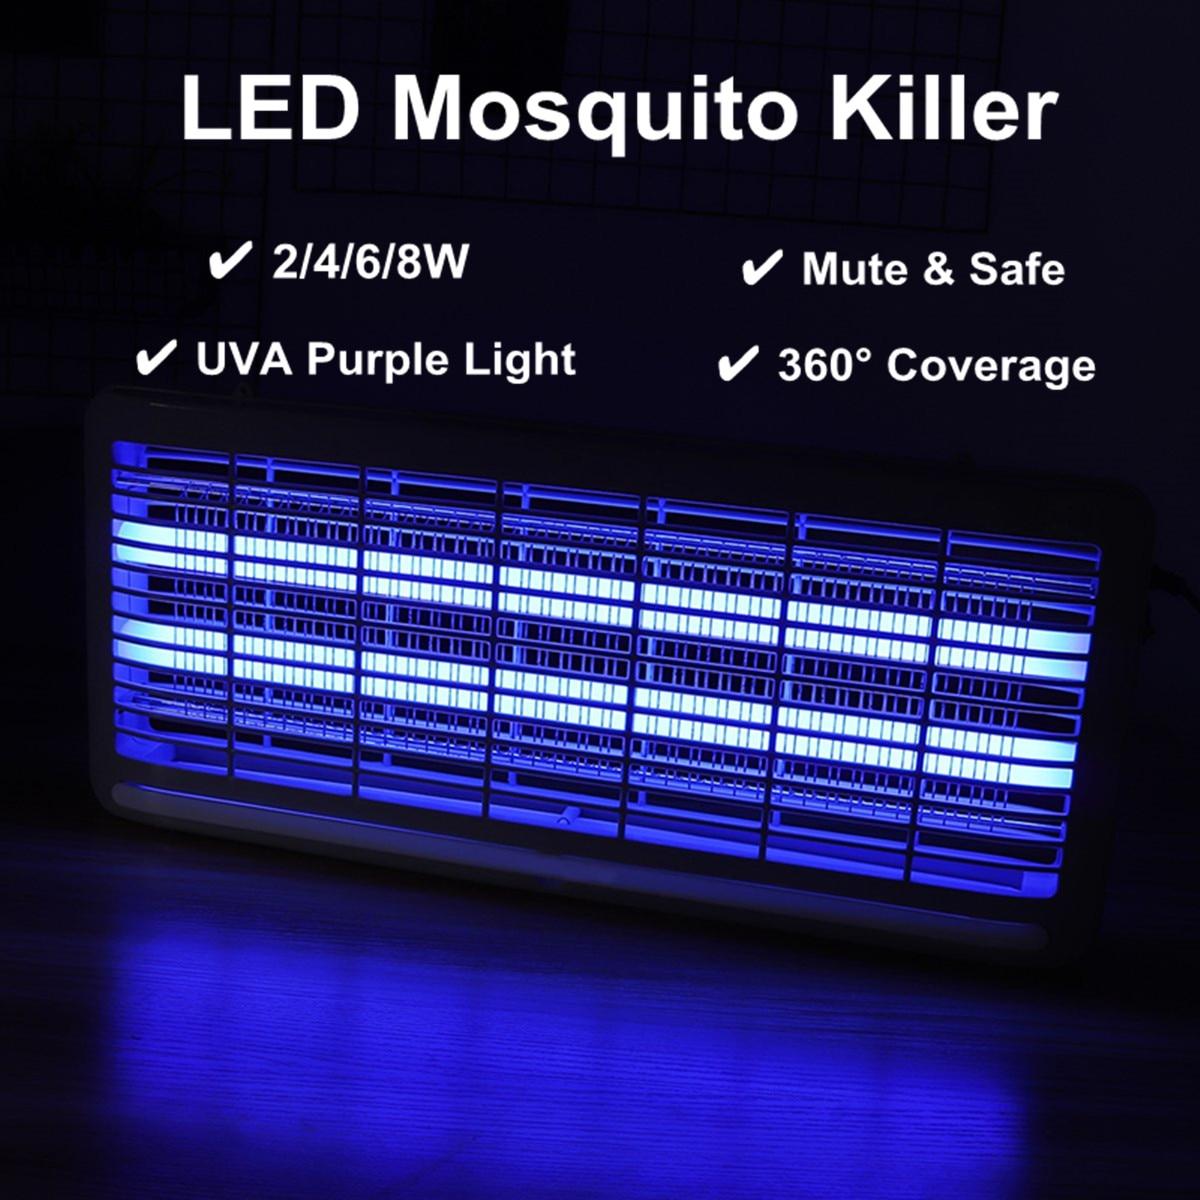 LED de luz eléctrica asesino de insectos UV-A Mosquito Pest Fly Bug Zapper trampas colector 2 W/4 W/6 w/8 W hogar herramientas de Control de plagas